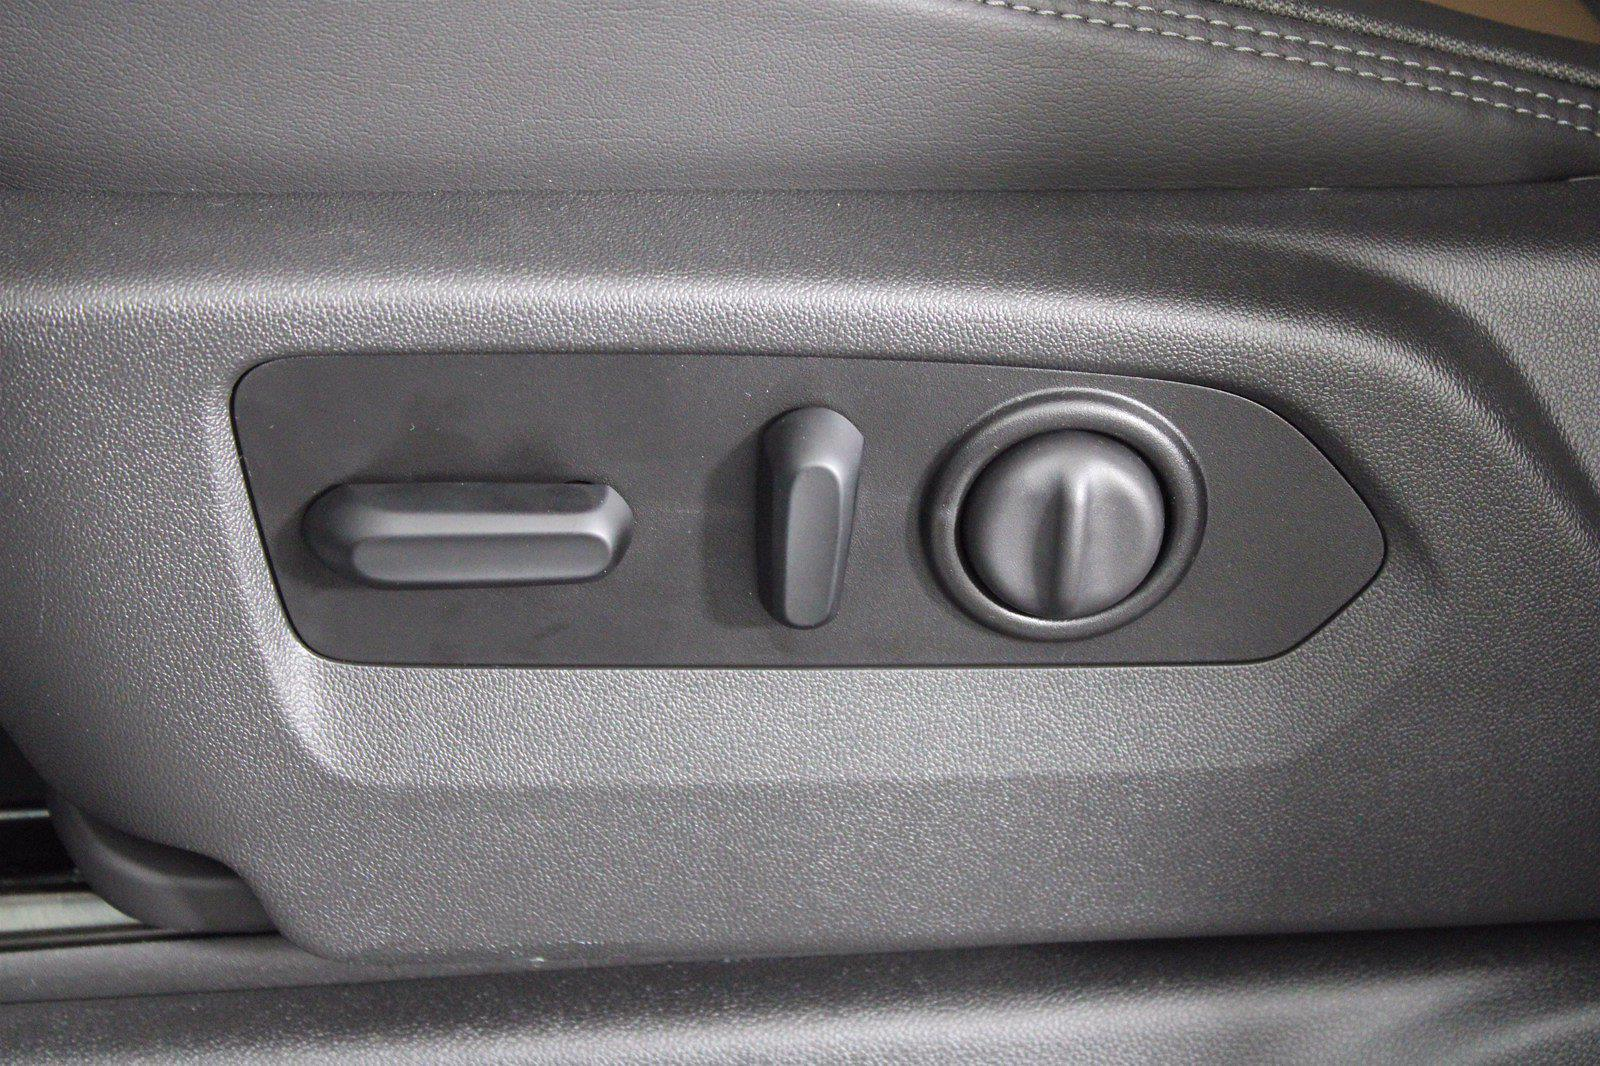 2021 Chevrolet Silverado 1500 Crew Cab 4x4, Pickup #D111069 - photo 14